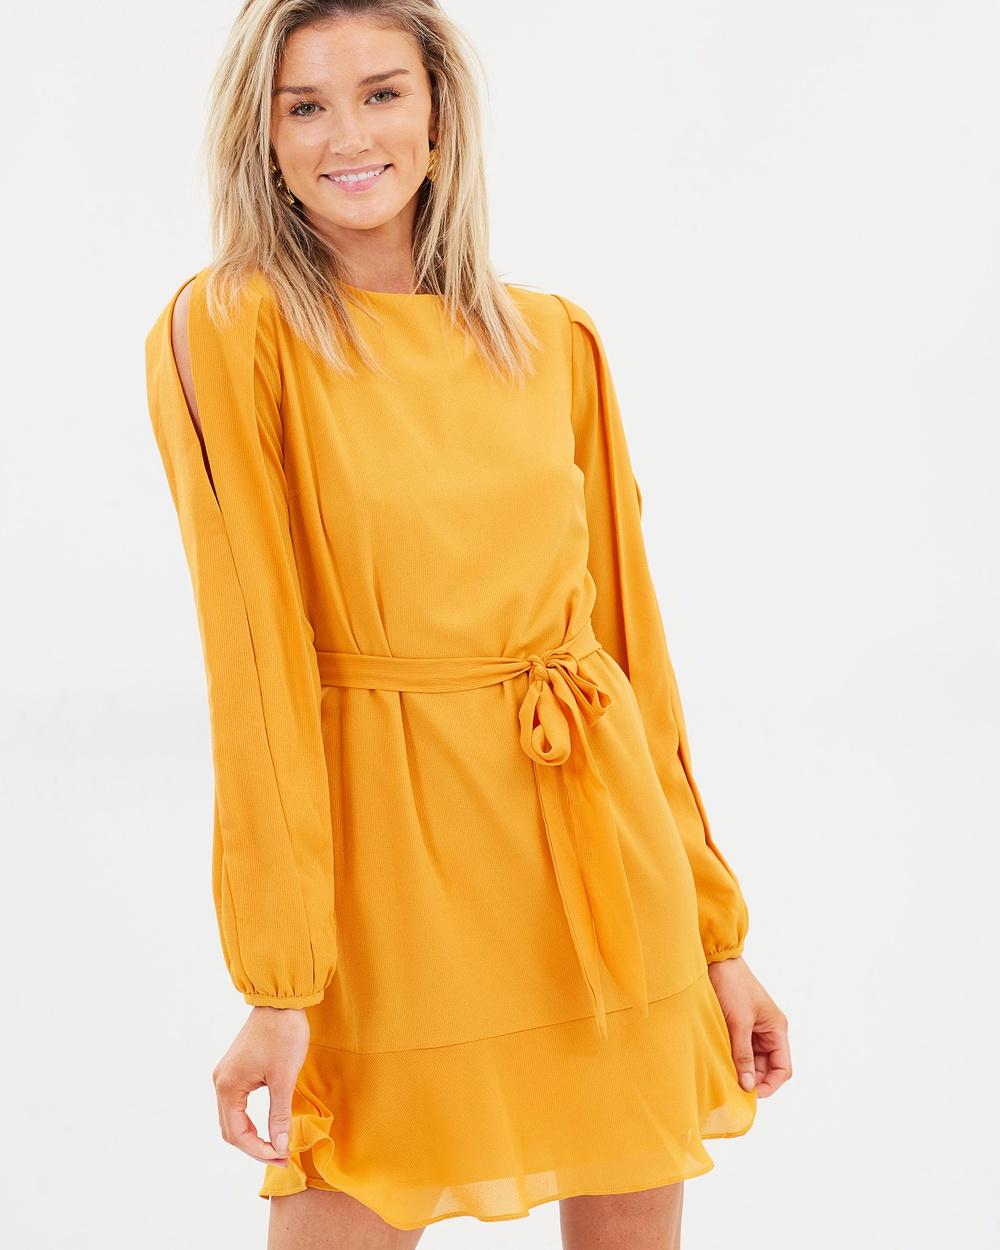 Cooper St Hariette Long Sleeve Mini Dress Dresses Beeswax Hariette Long Sleeve Mini Dress